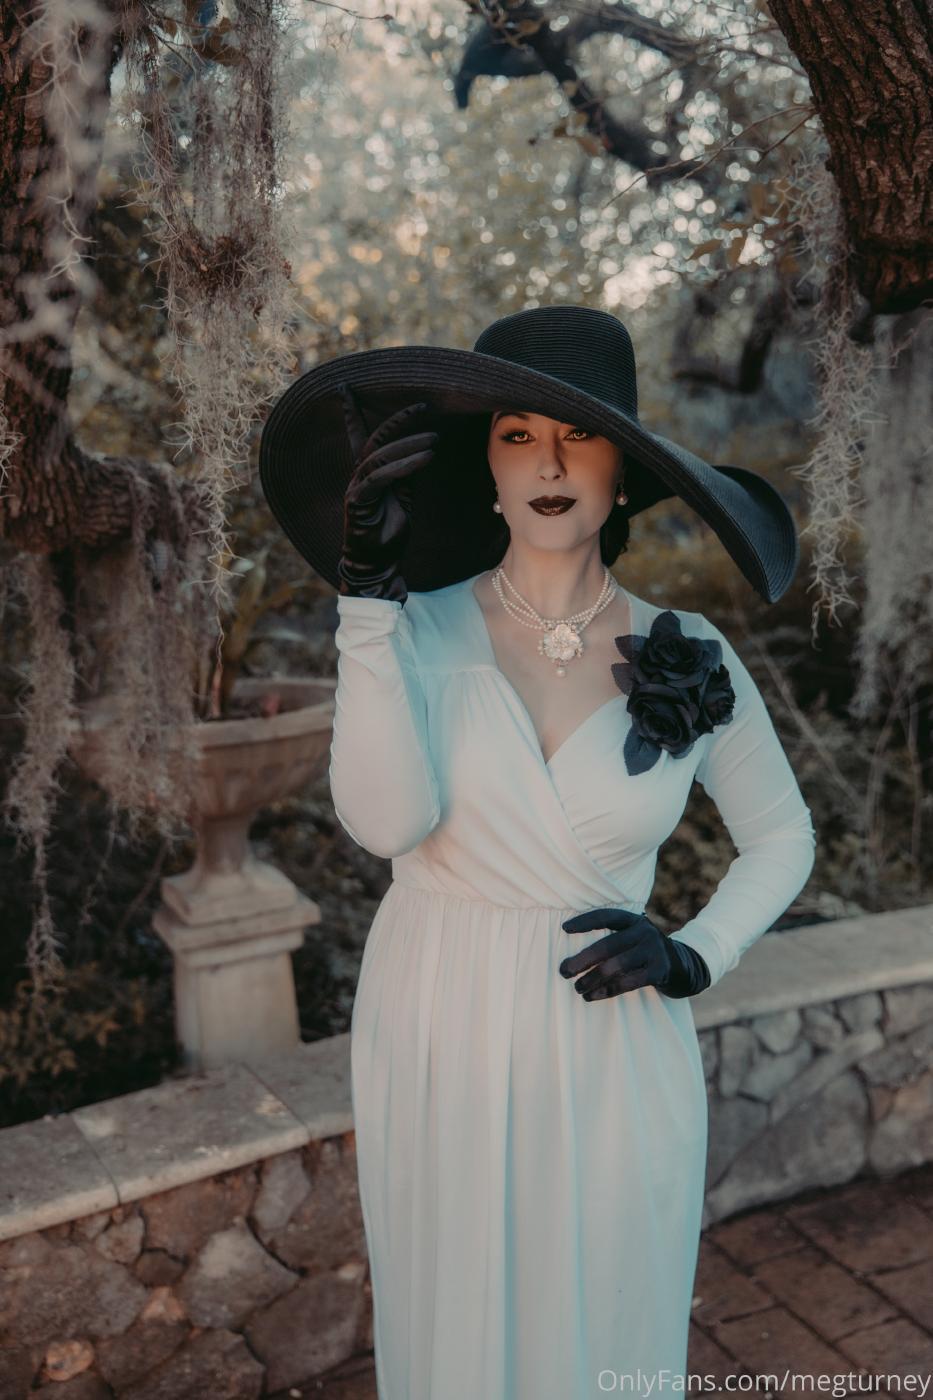 Meg Turney Lady Dimitrescu Cosplay Onlyfans Set Leaked 0048